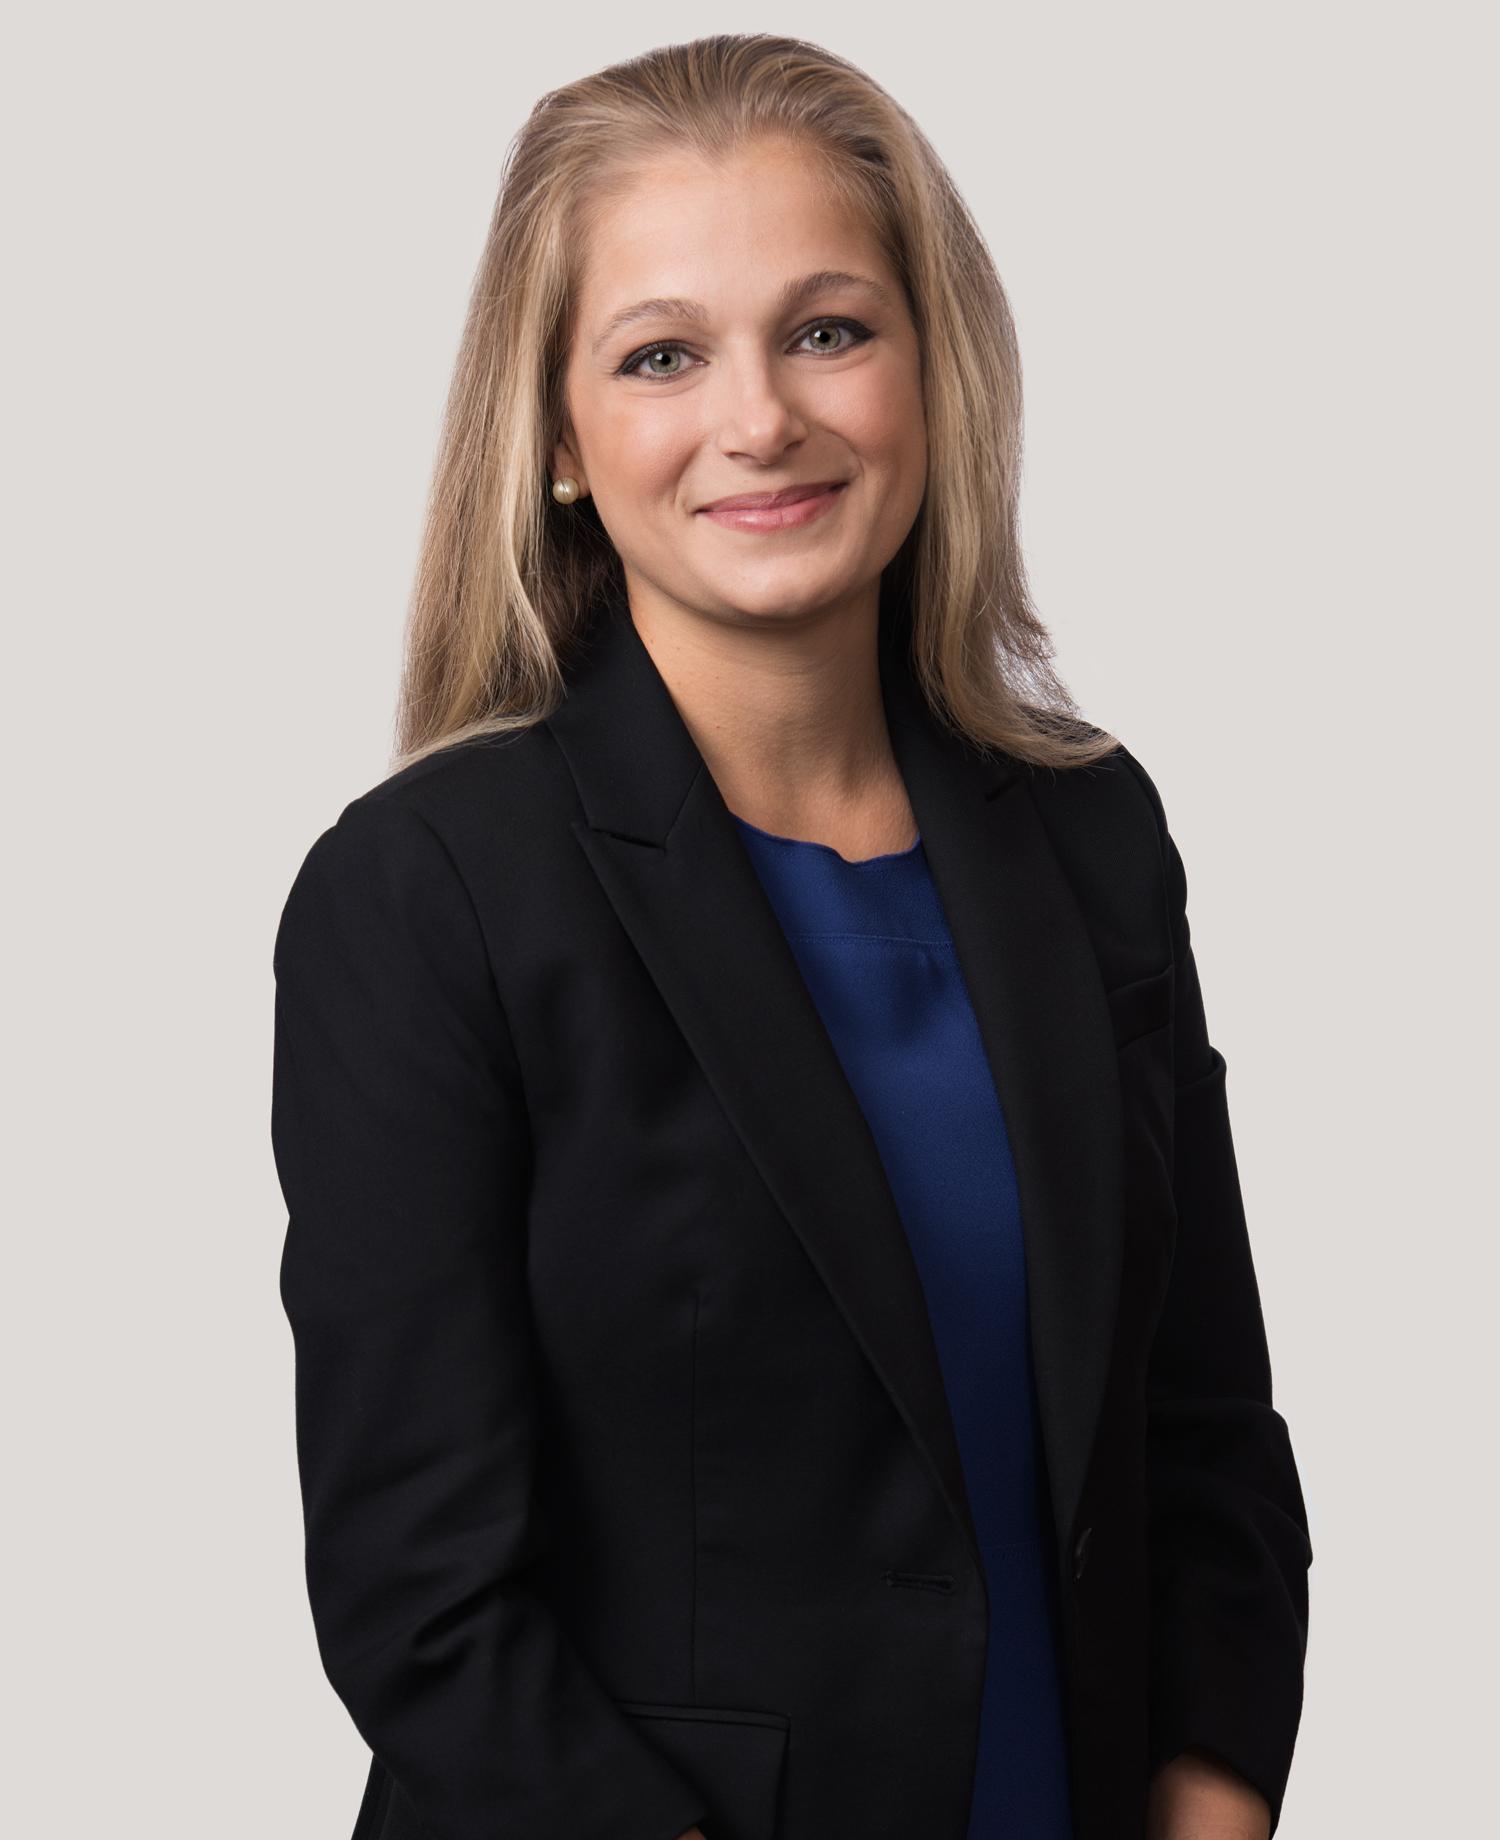 Michelle L. Rogers